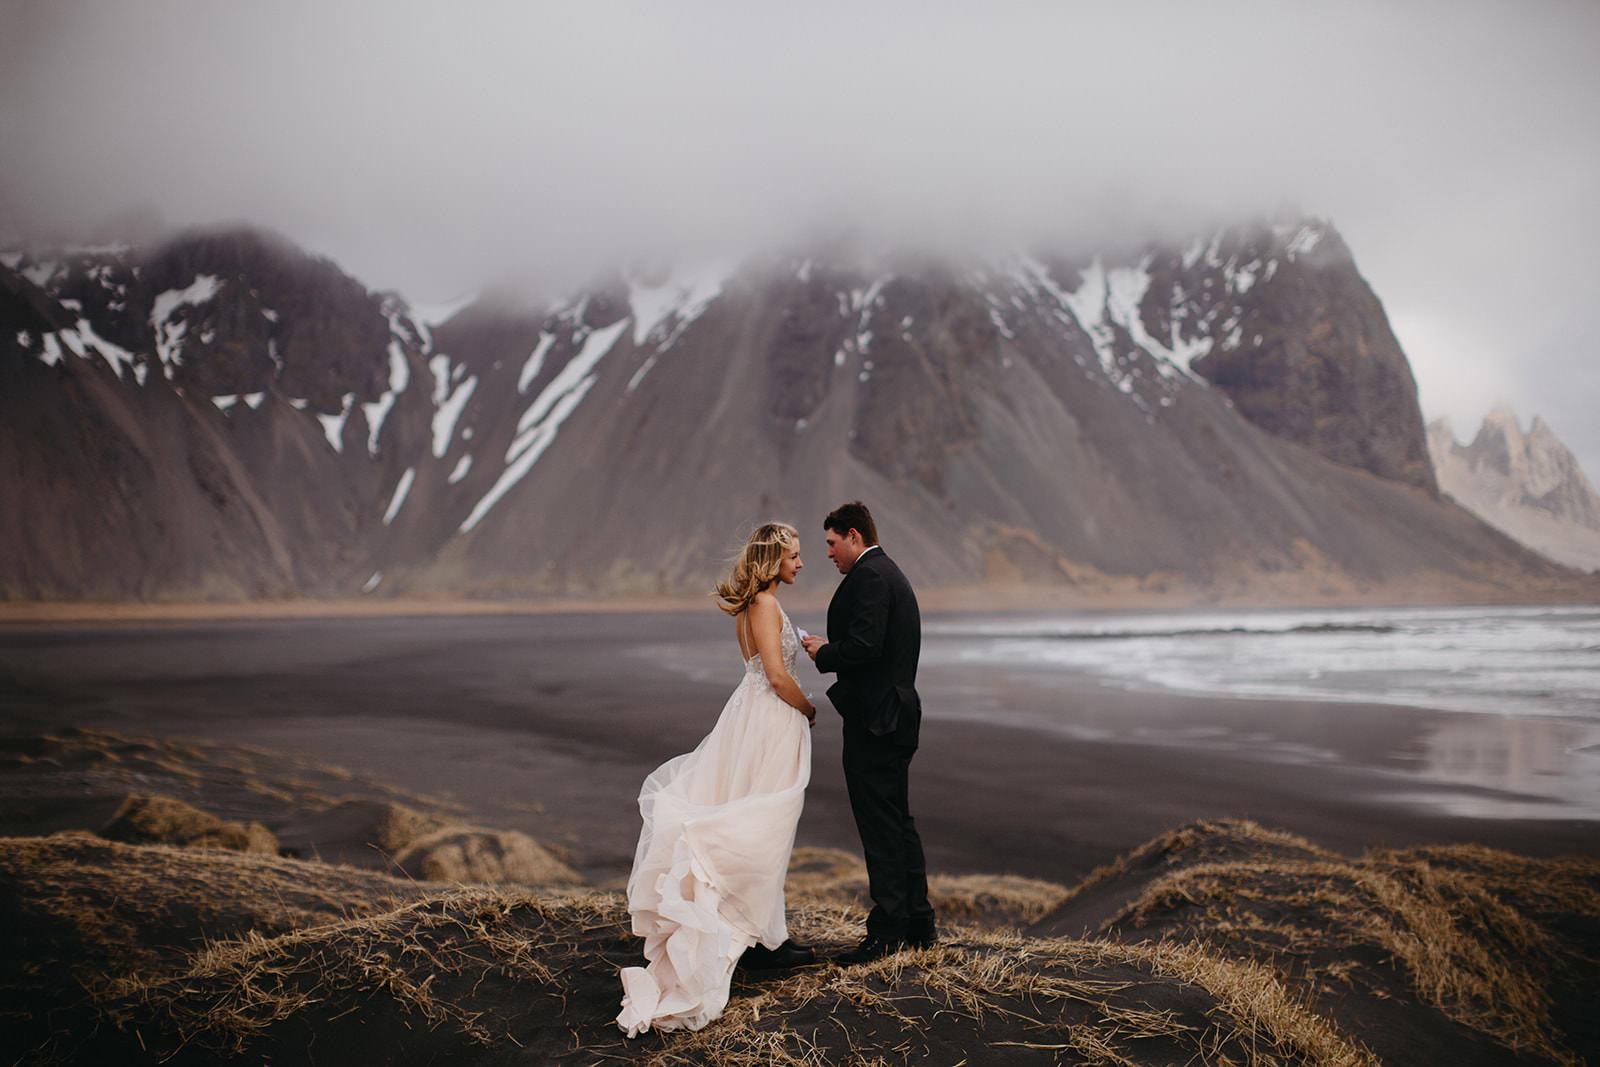 Icelandic Iceland Elopement Wedding Elope Photographer Eloping Reykjavík Vik Black Sand Beach Jökulsárlón Skogafoss Waterfall Vestrahorn Mountain Liz Osban Photography Destination 23.jpg